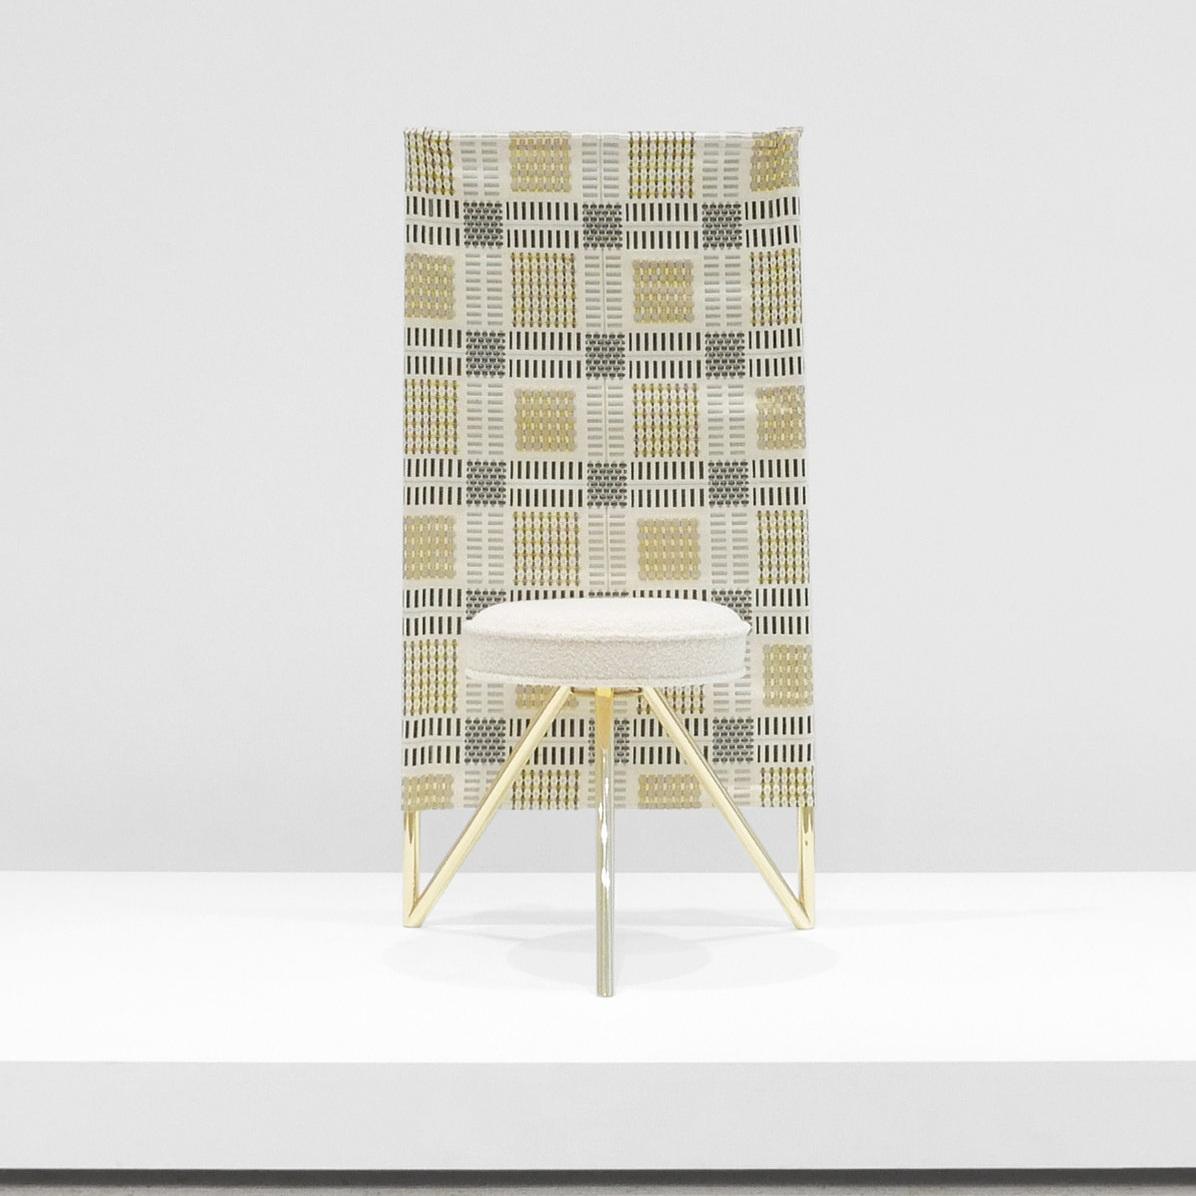 philippe Starck 'miss wirt' chair sold